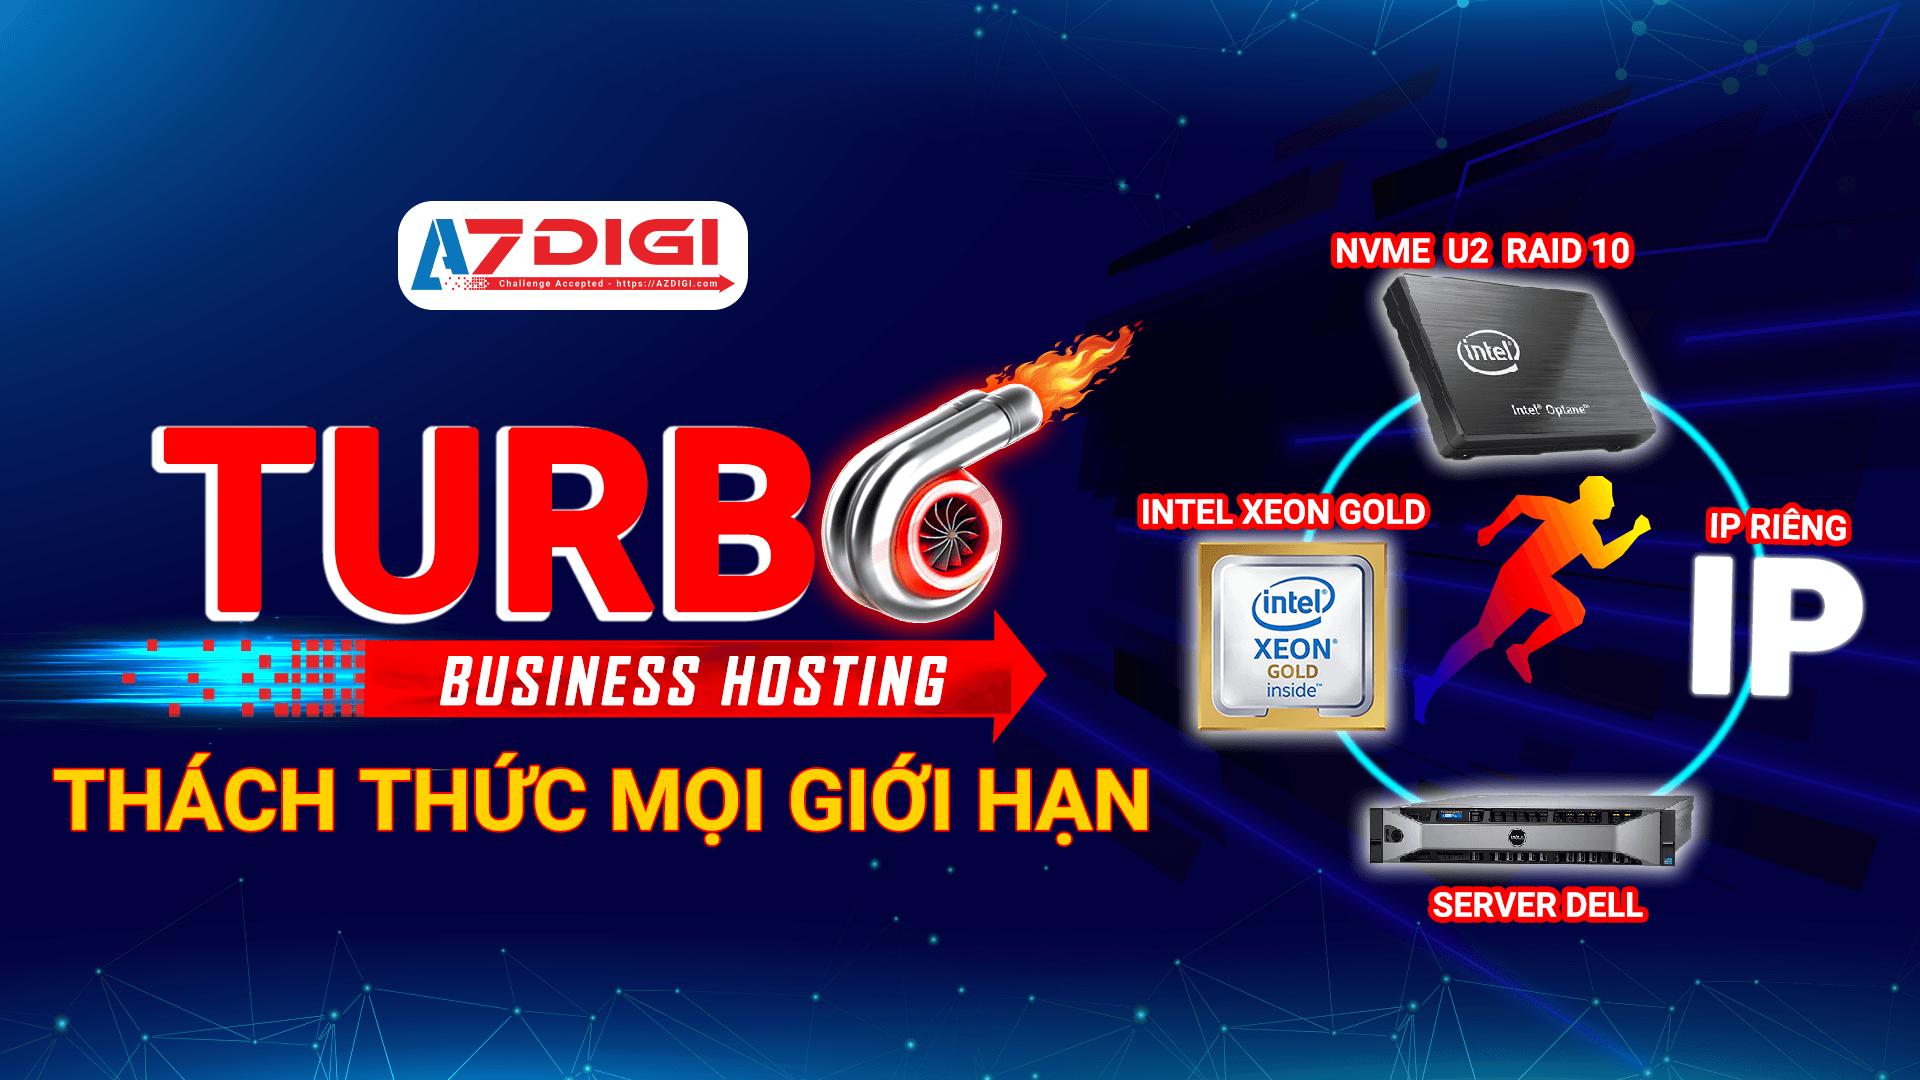 2 Turbo Business Hosting 1920x1080 2